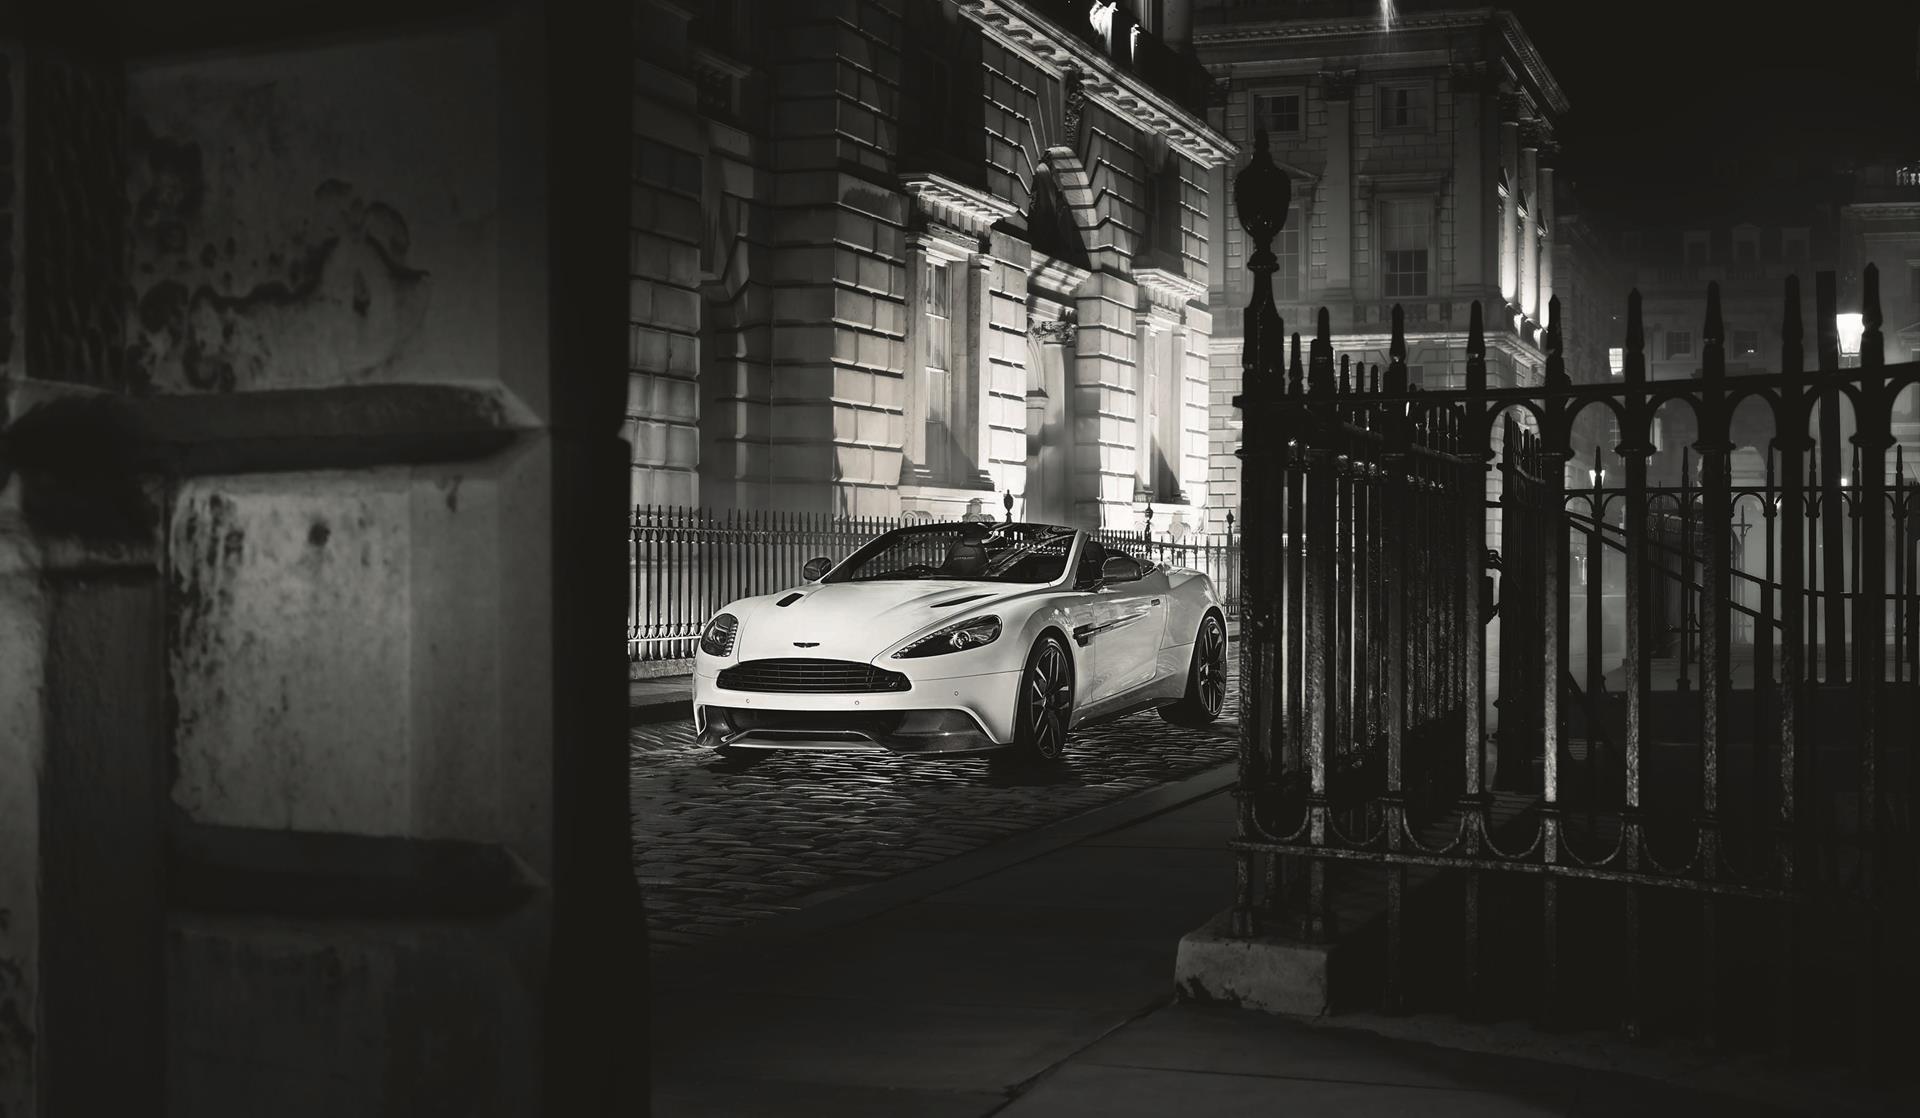 2015 Aston Martin Vanquish Carbon Black Wallpapers Hd Drivespark